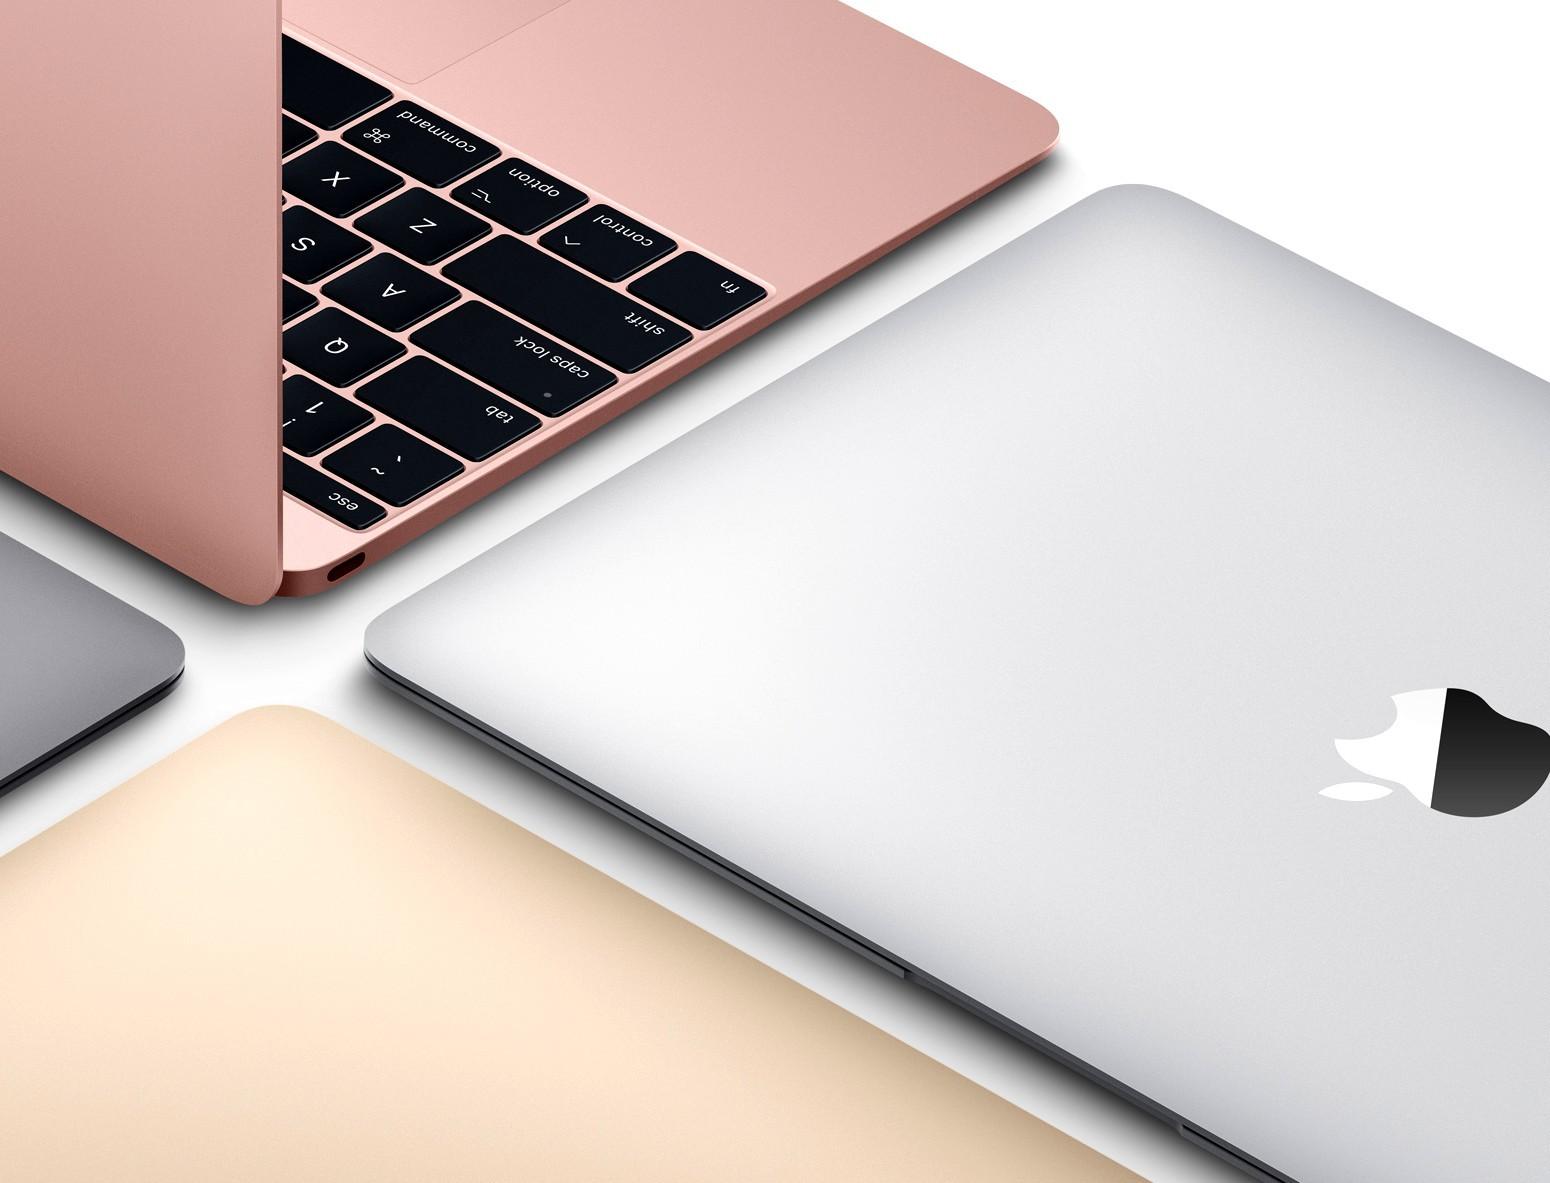 Ремонт ноутбуков Apple в Омске